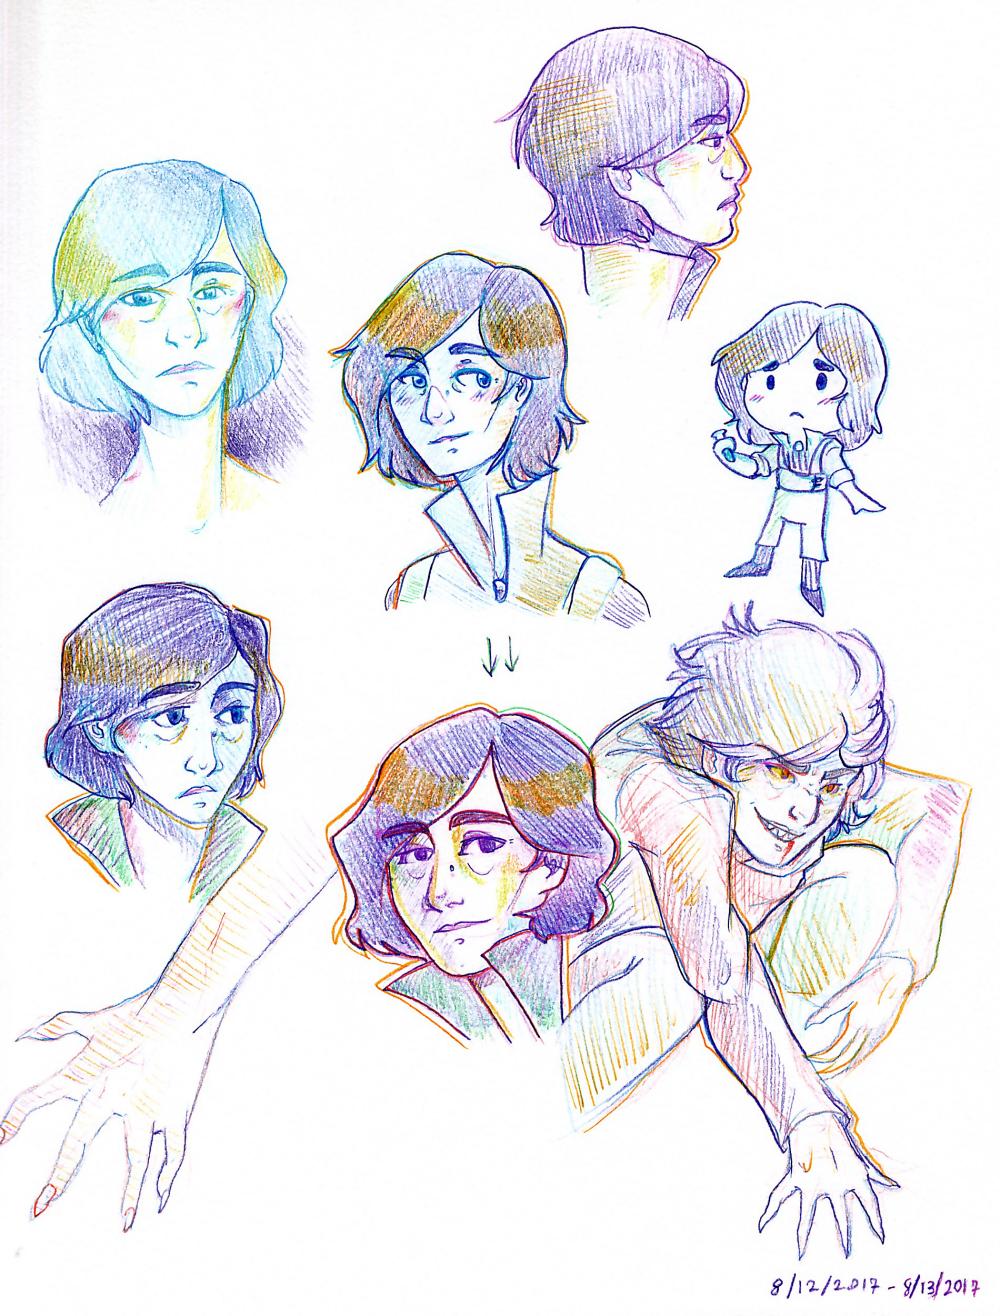 [Sketchbook] Hypatia